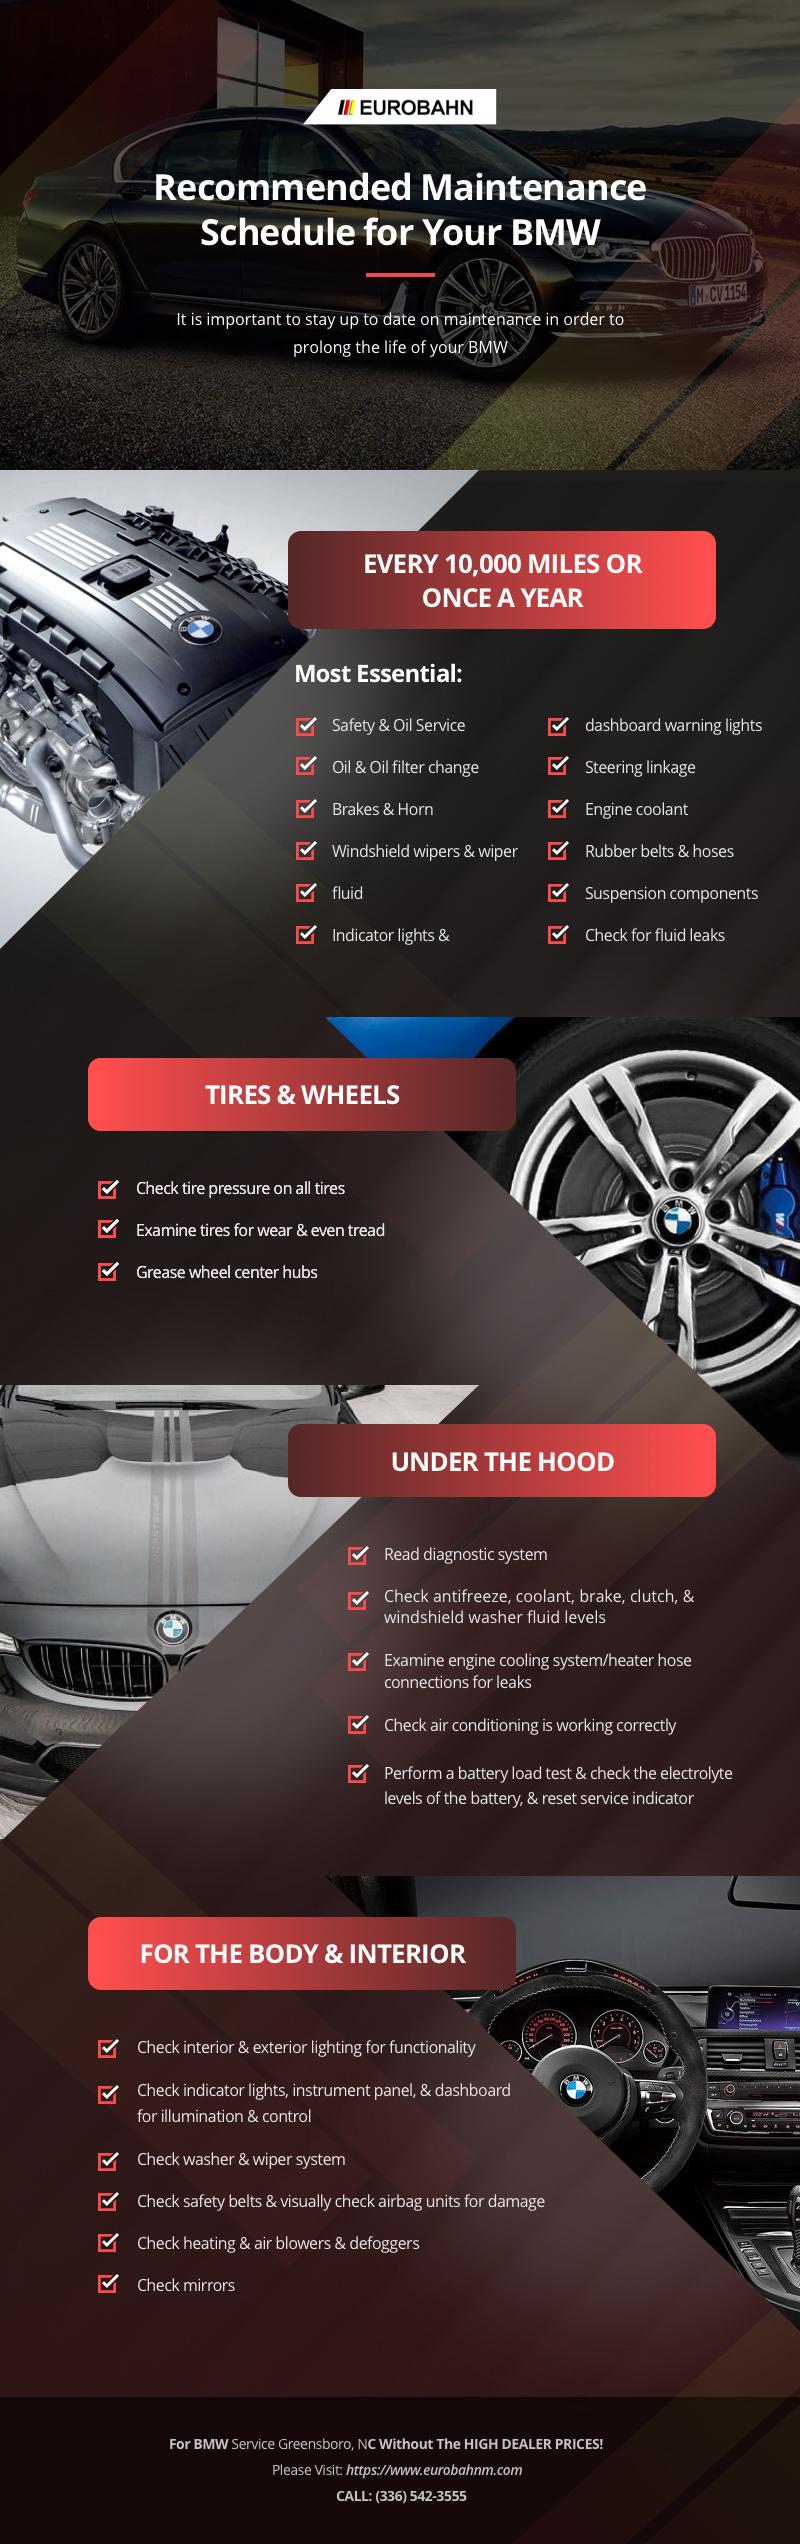 Kia Optima: Checking BrakeClutch Fluid Level